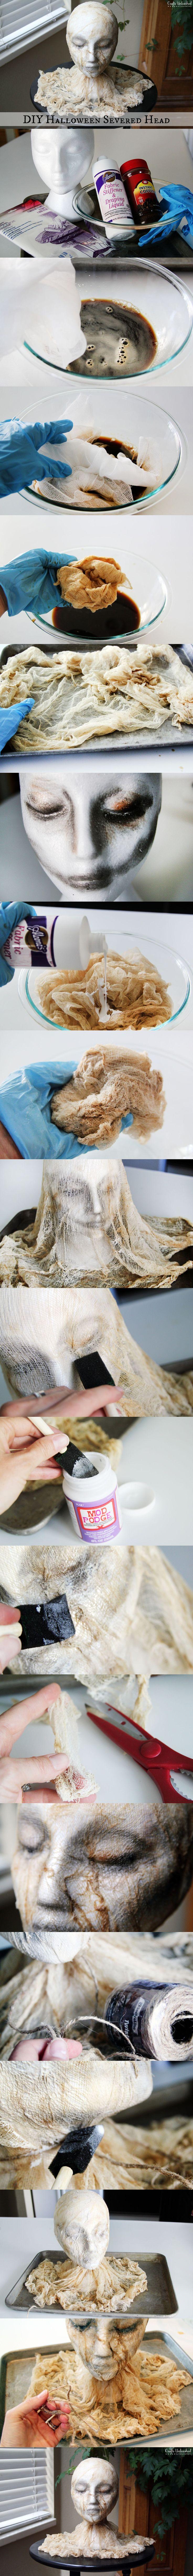 Best 25+ Scary halloween decorations ideas on Pinterest   Spooky ...